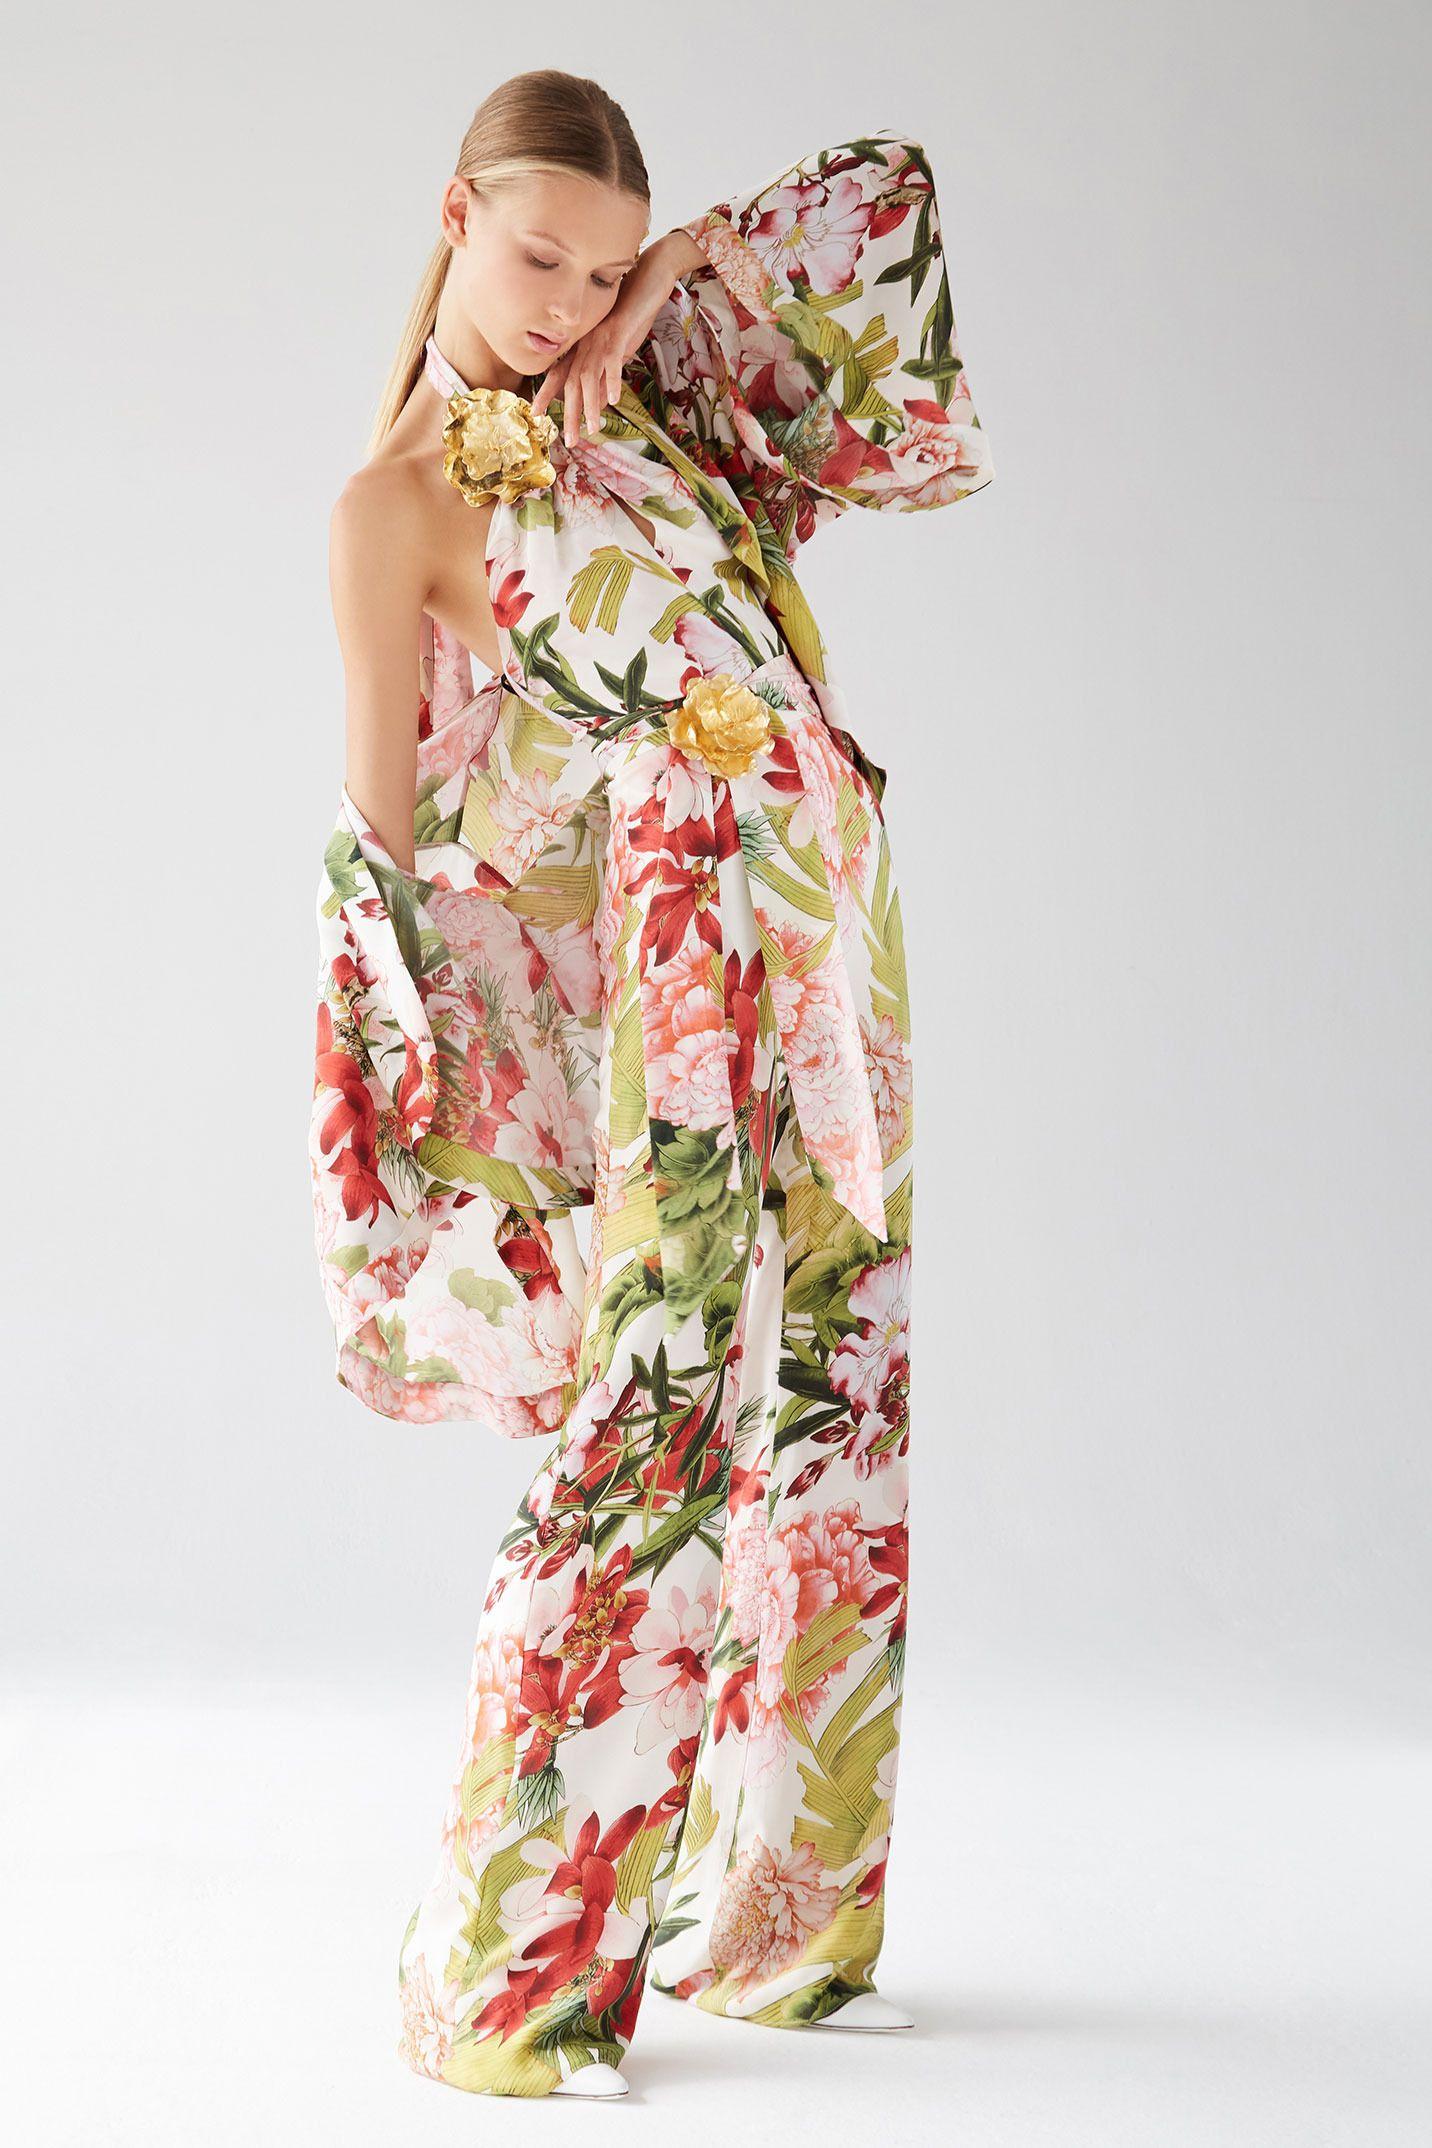 e2cf786fee Josie Natori | Runway 2018 | Fashion, Spring fashion trends, Floral ...